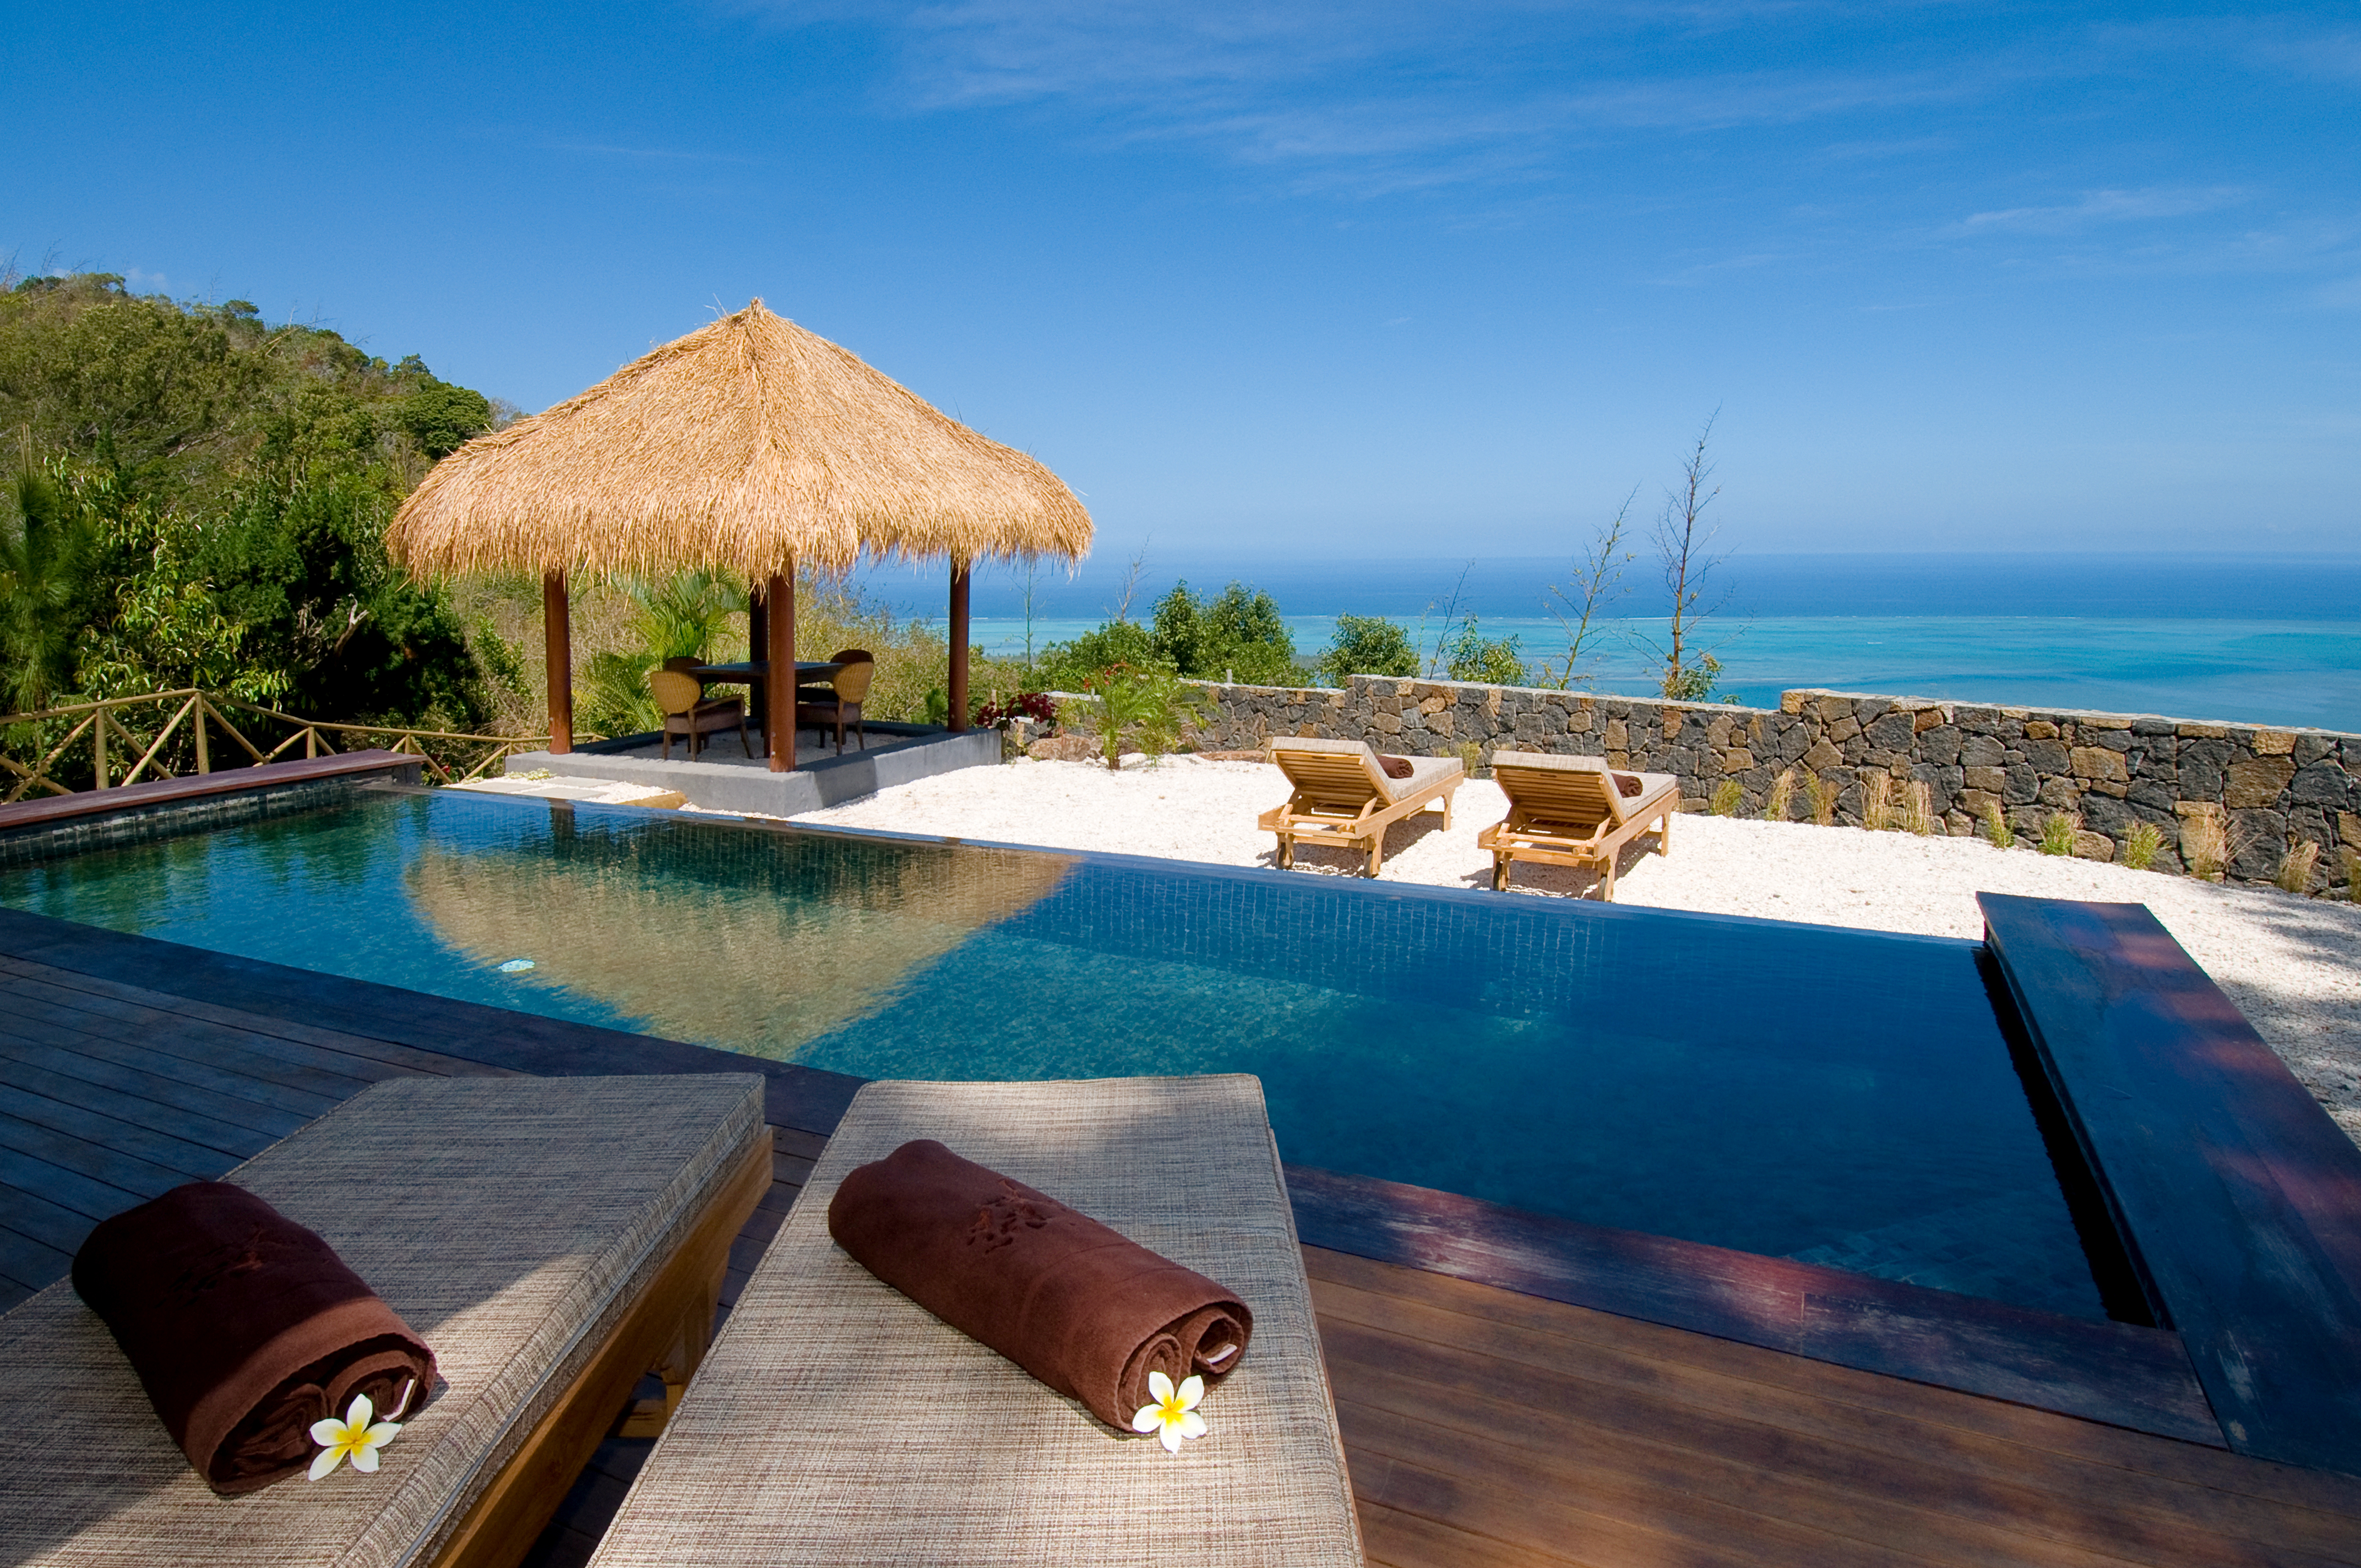 Seaview-pool-Suite-Lakaz-Chamarel-Exclusive-Lodge-Mauritius